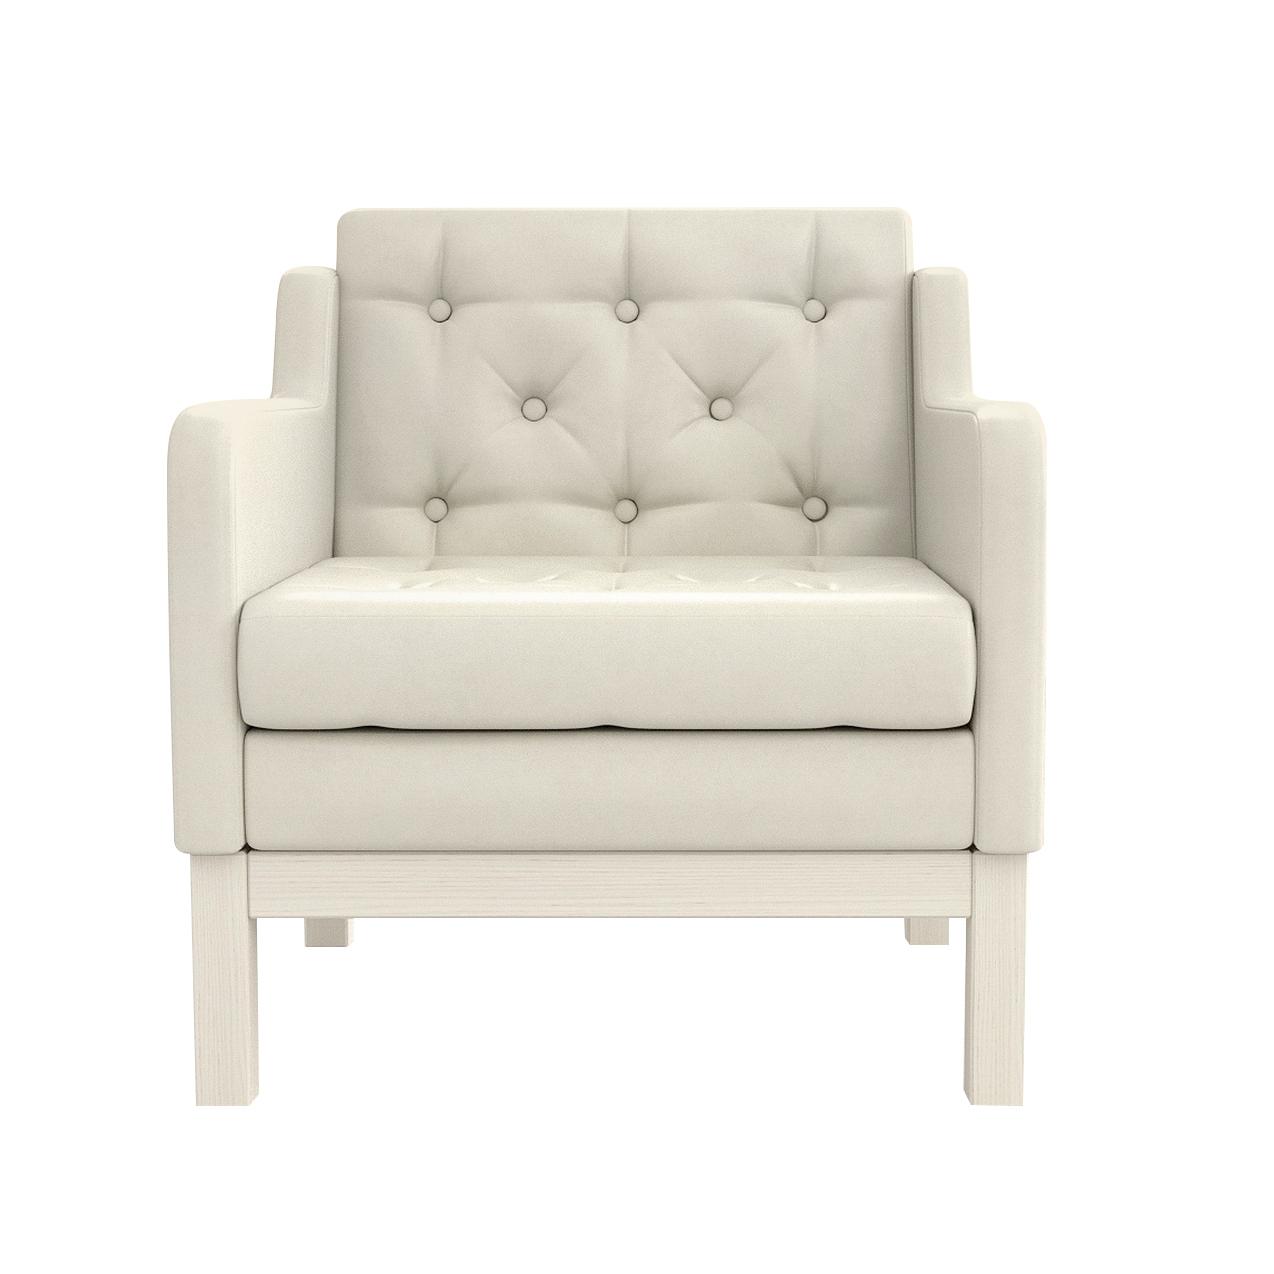 Фото - Кресло AS Алана 75.5x82x83 беленый дуб/белый диван as алана м 154x82x83 беленый дуб белый